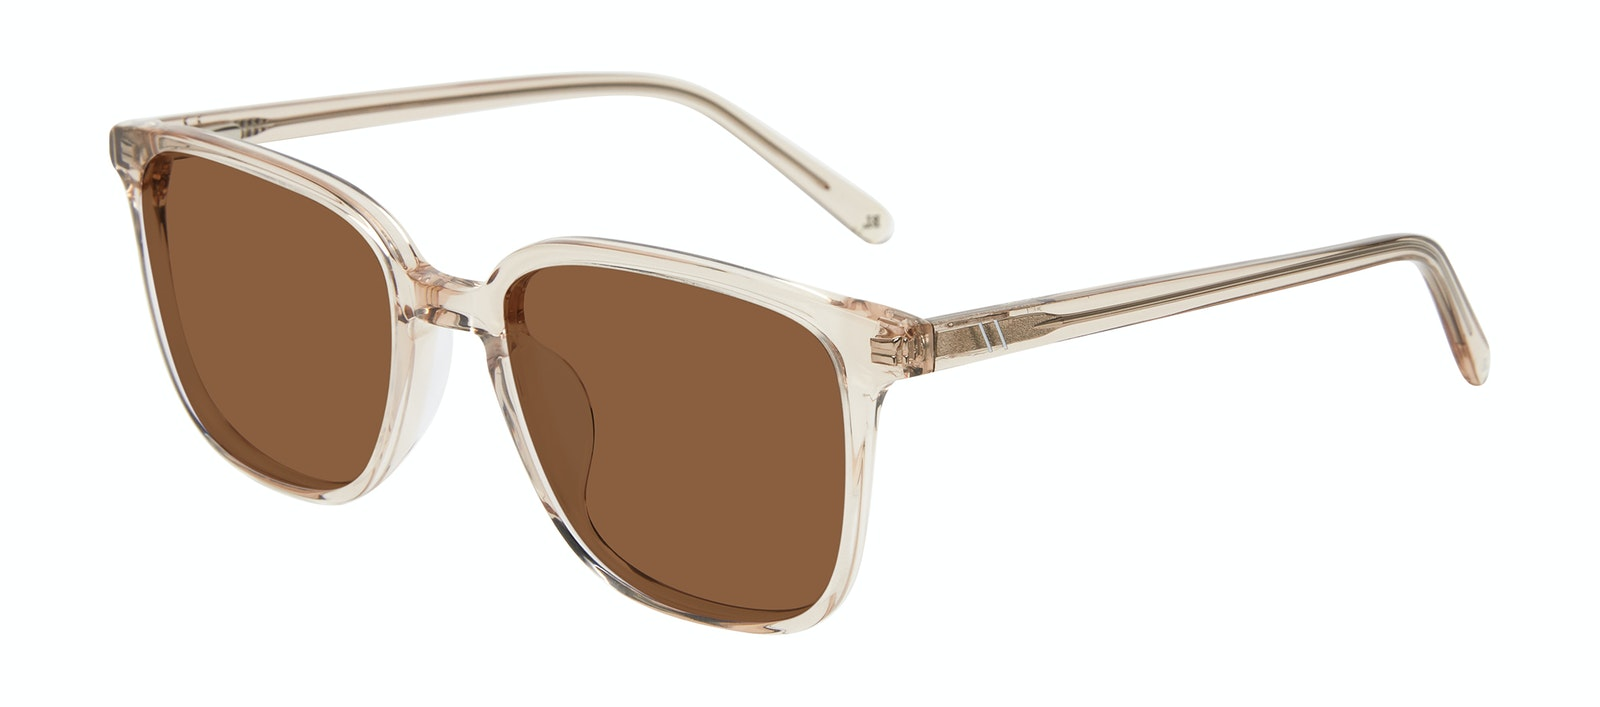 Affordable Fashion Glasses Square Sunglasses Men Fellow Golden Tilt